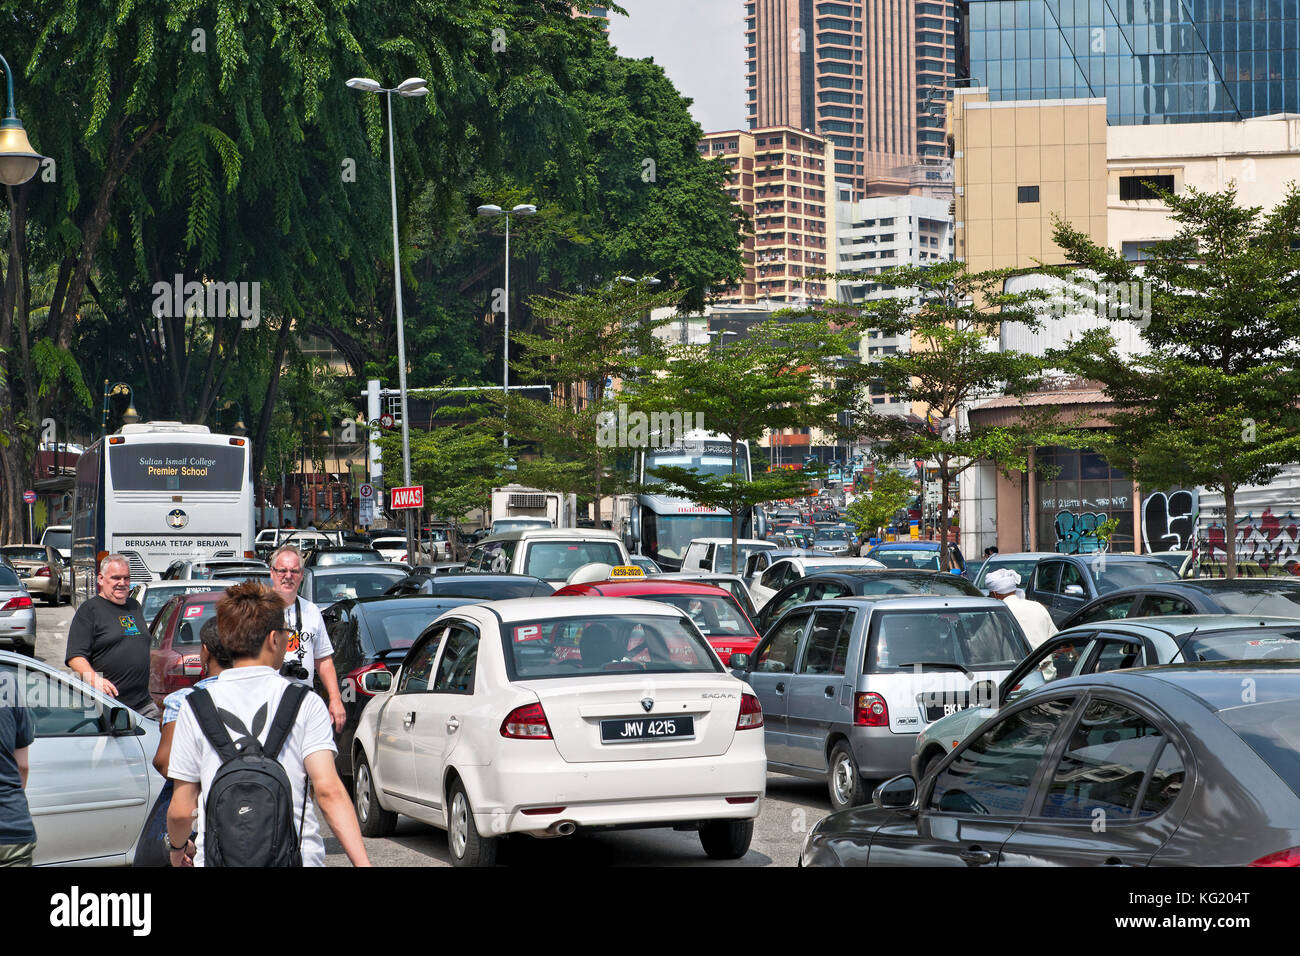 Kuala Lumpur, Malaysia: Jalan Pudu: STAU Stockfoto